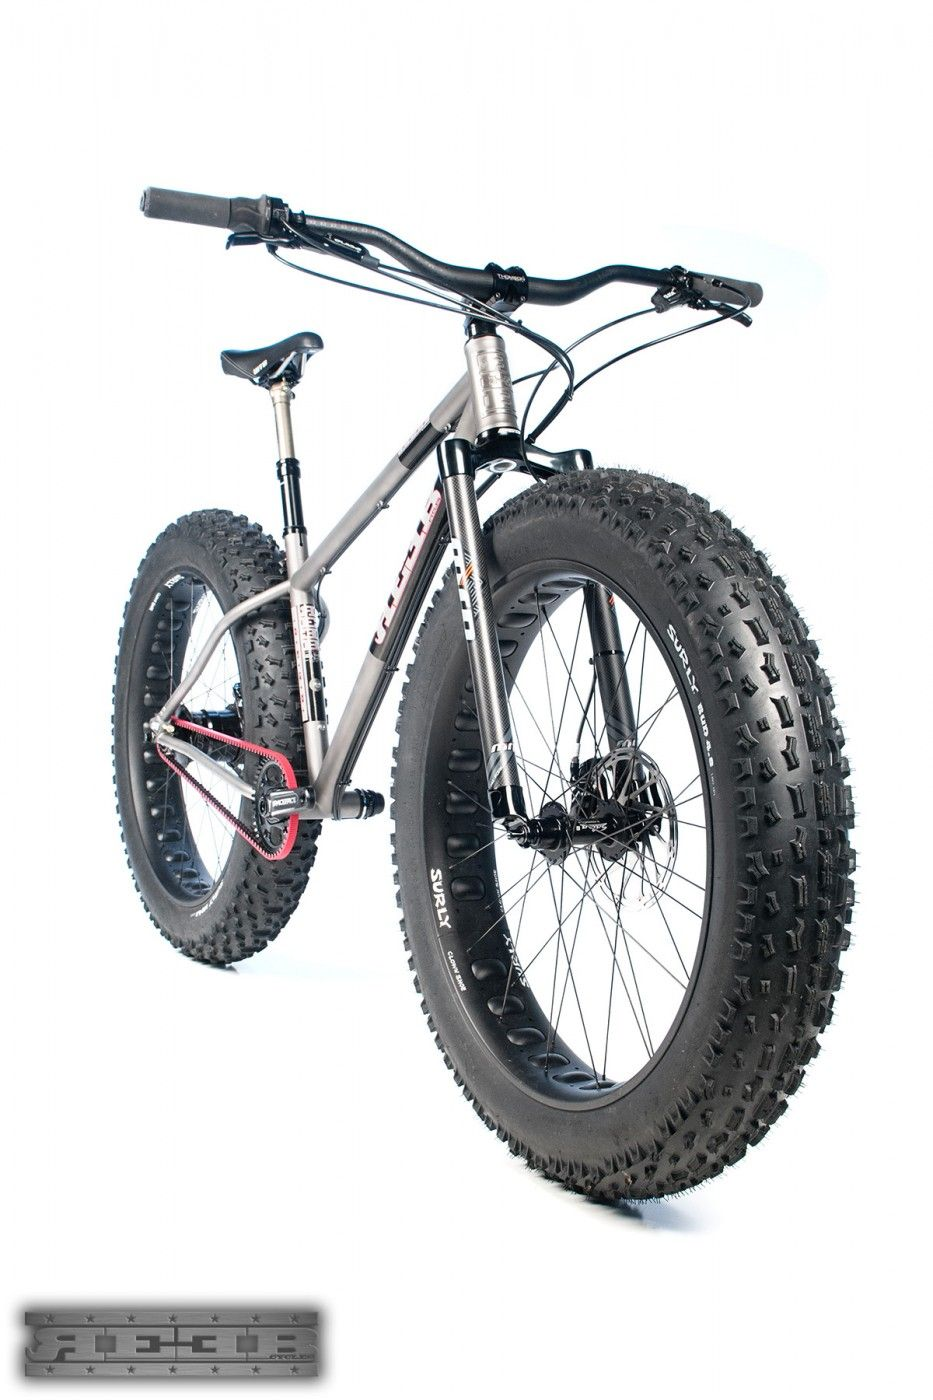 Titanium Fat Bike Gates Carbon Belt Drive Fork Thompson Bmw Dropper Seatpost